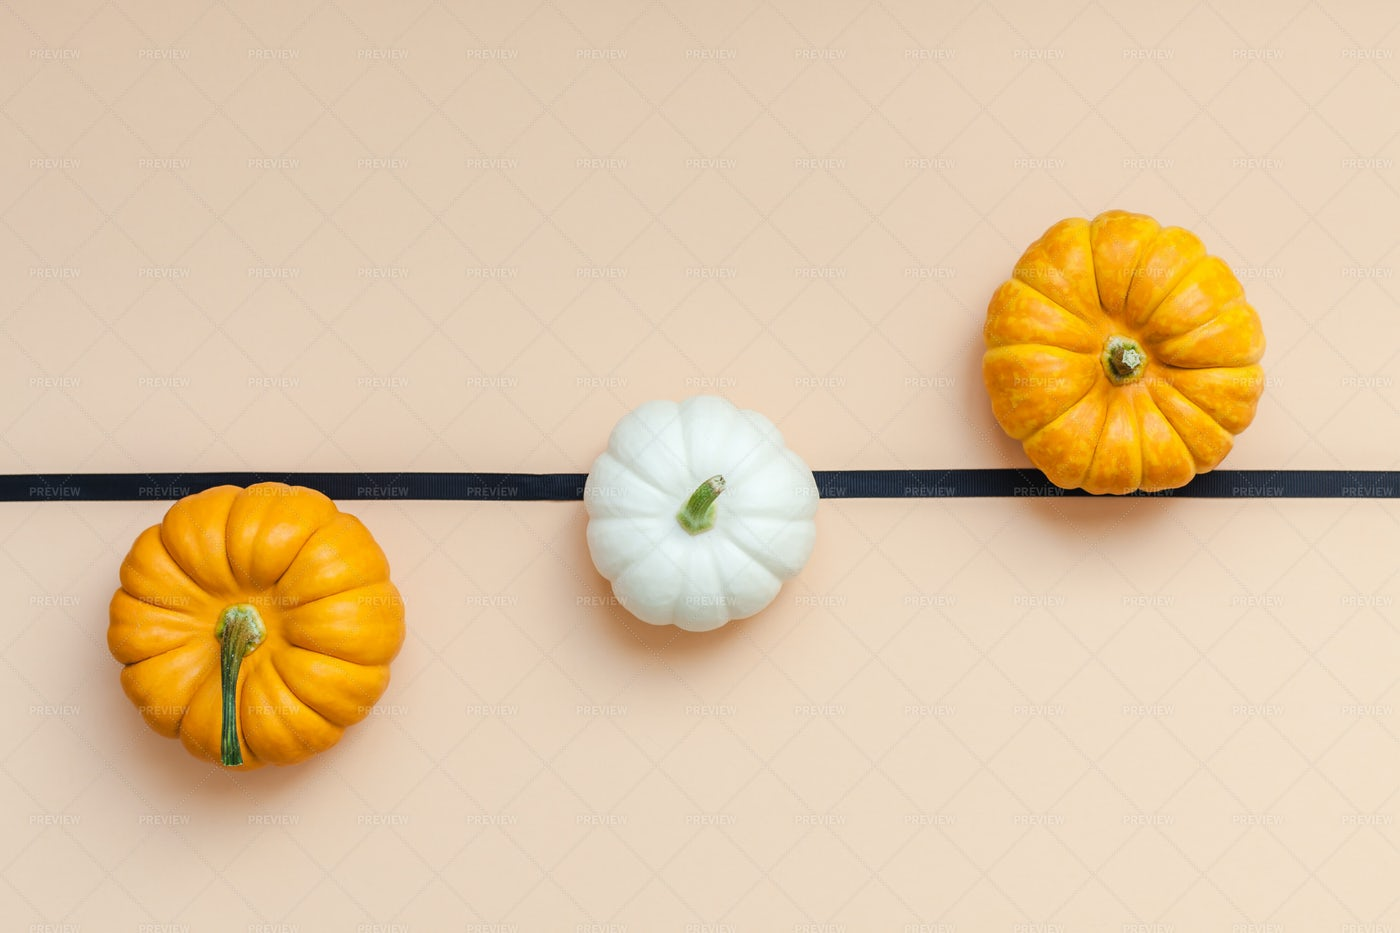 White And Yellow Pumpkins: Stock Photos